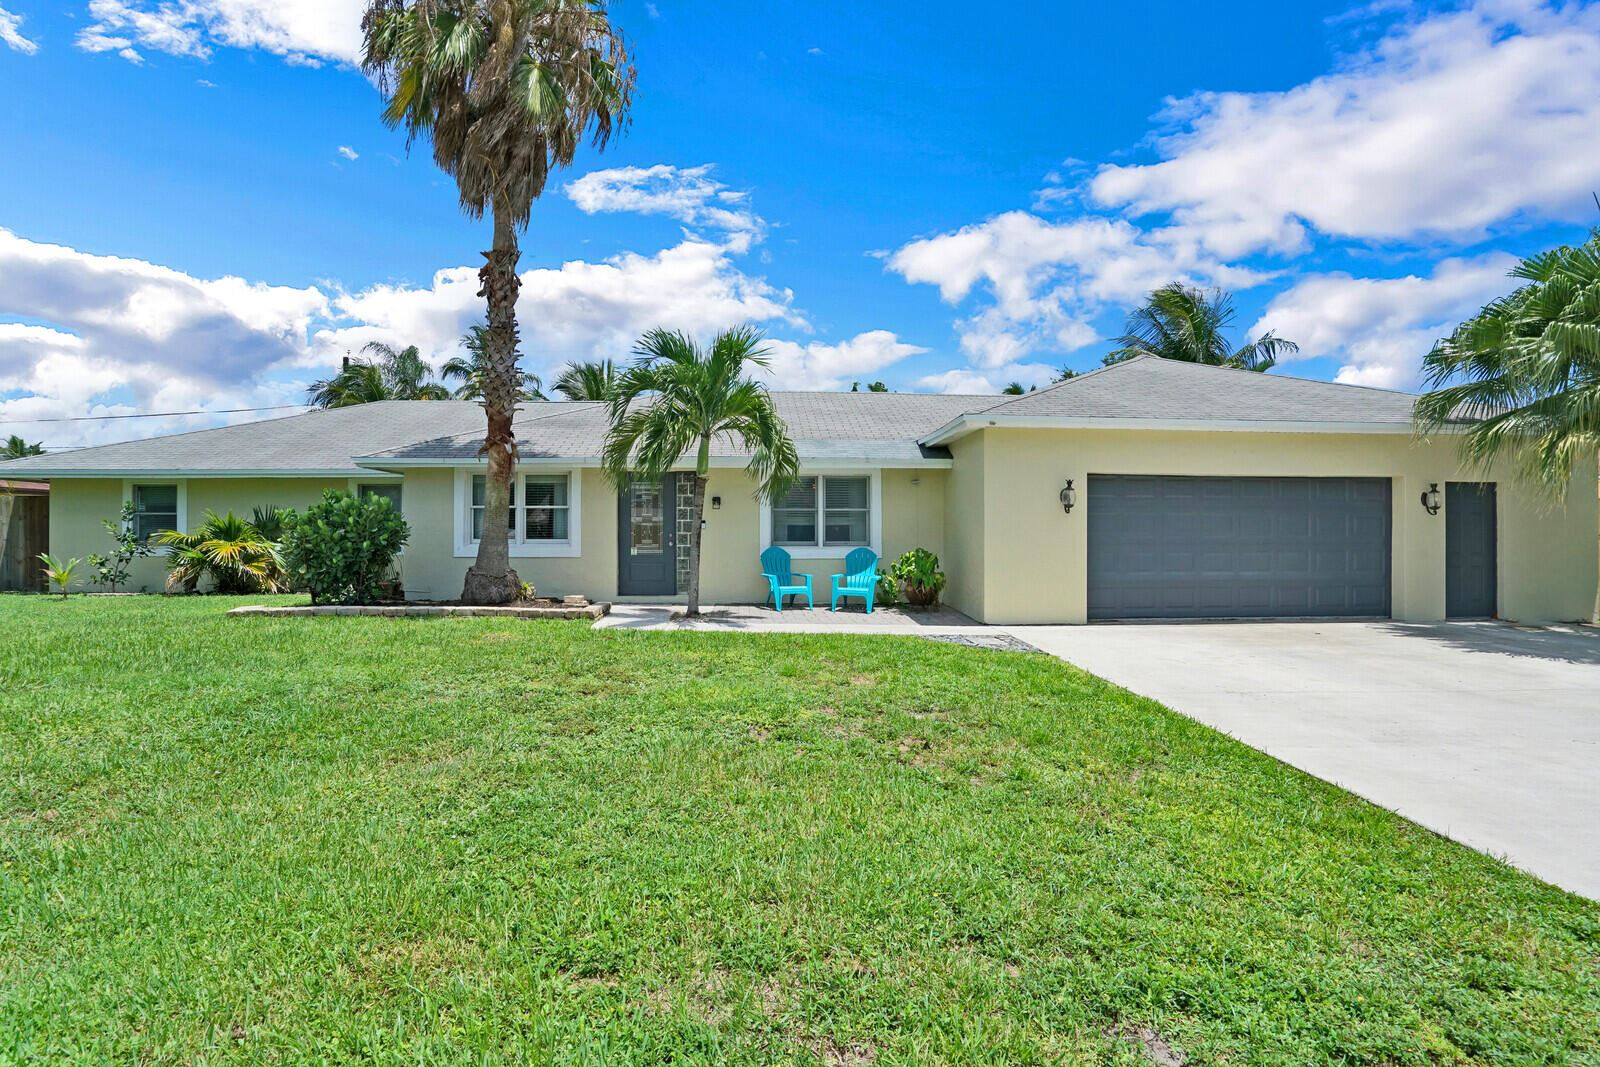 3885 Dorrit Avenue, Boynton Beach, FL 33436 - MLS#: RX-10732164